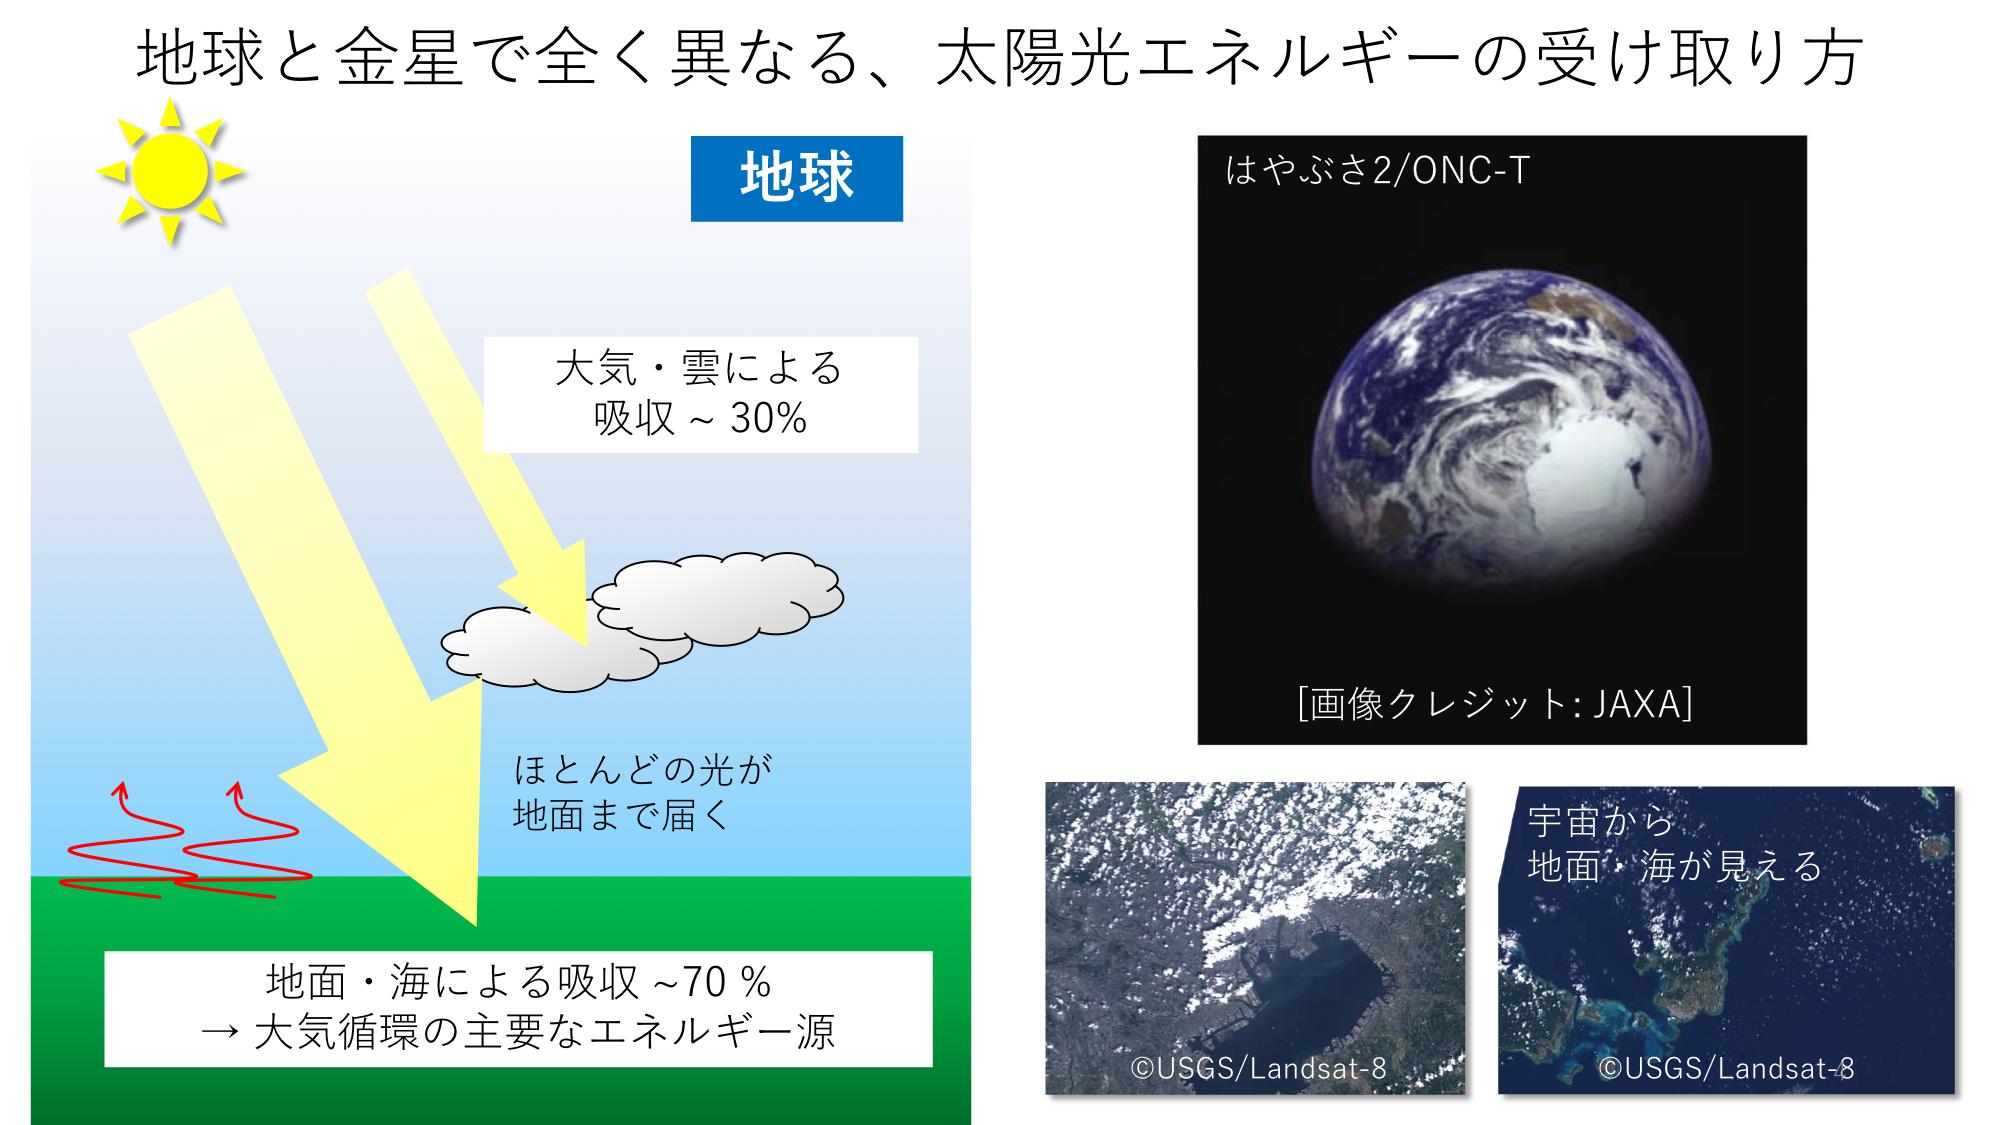 f:id:Imamura:20191119205347p:plain